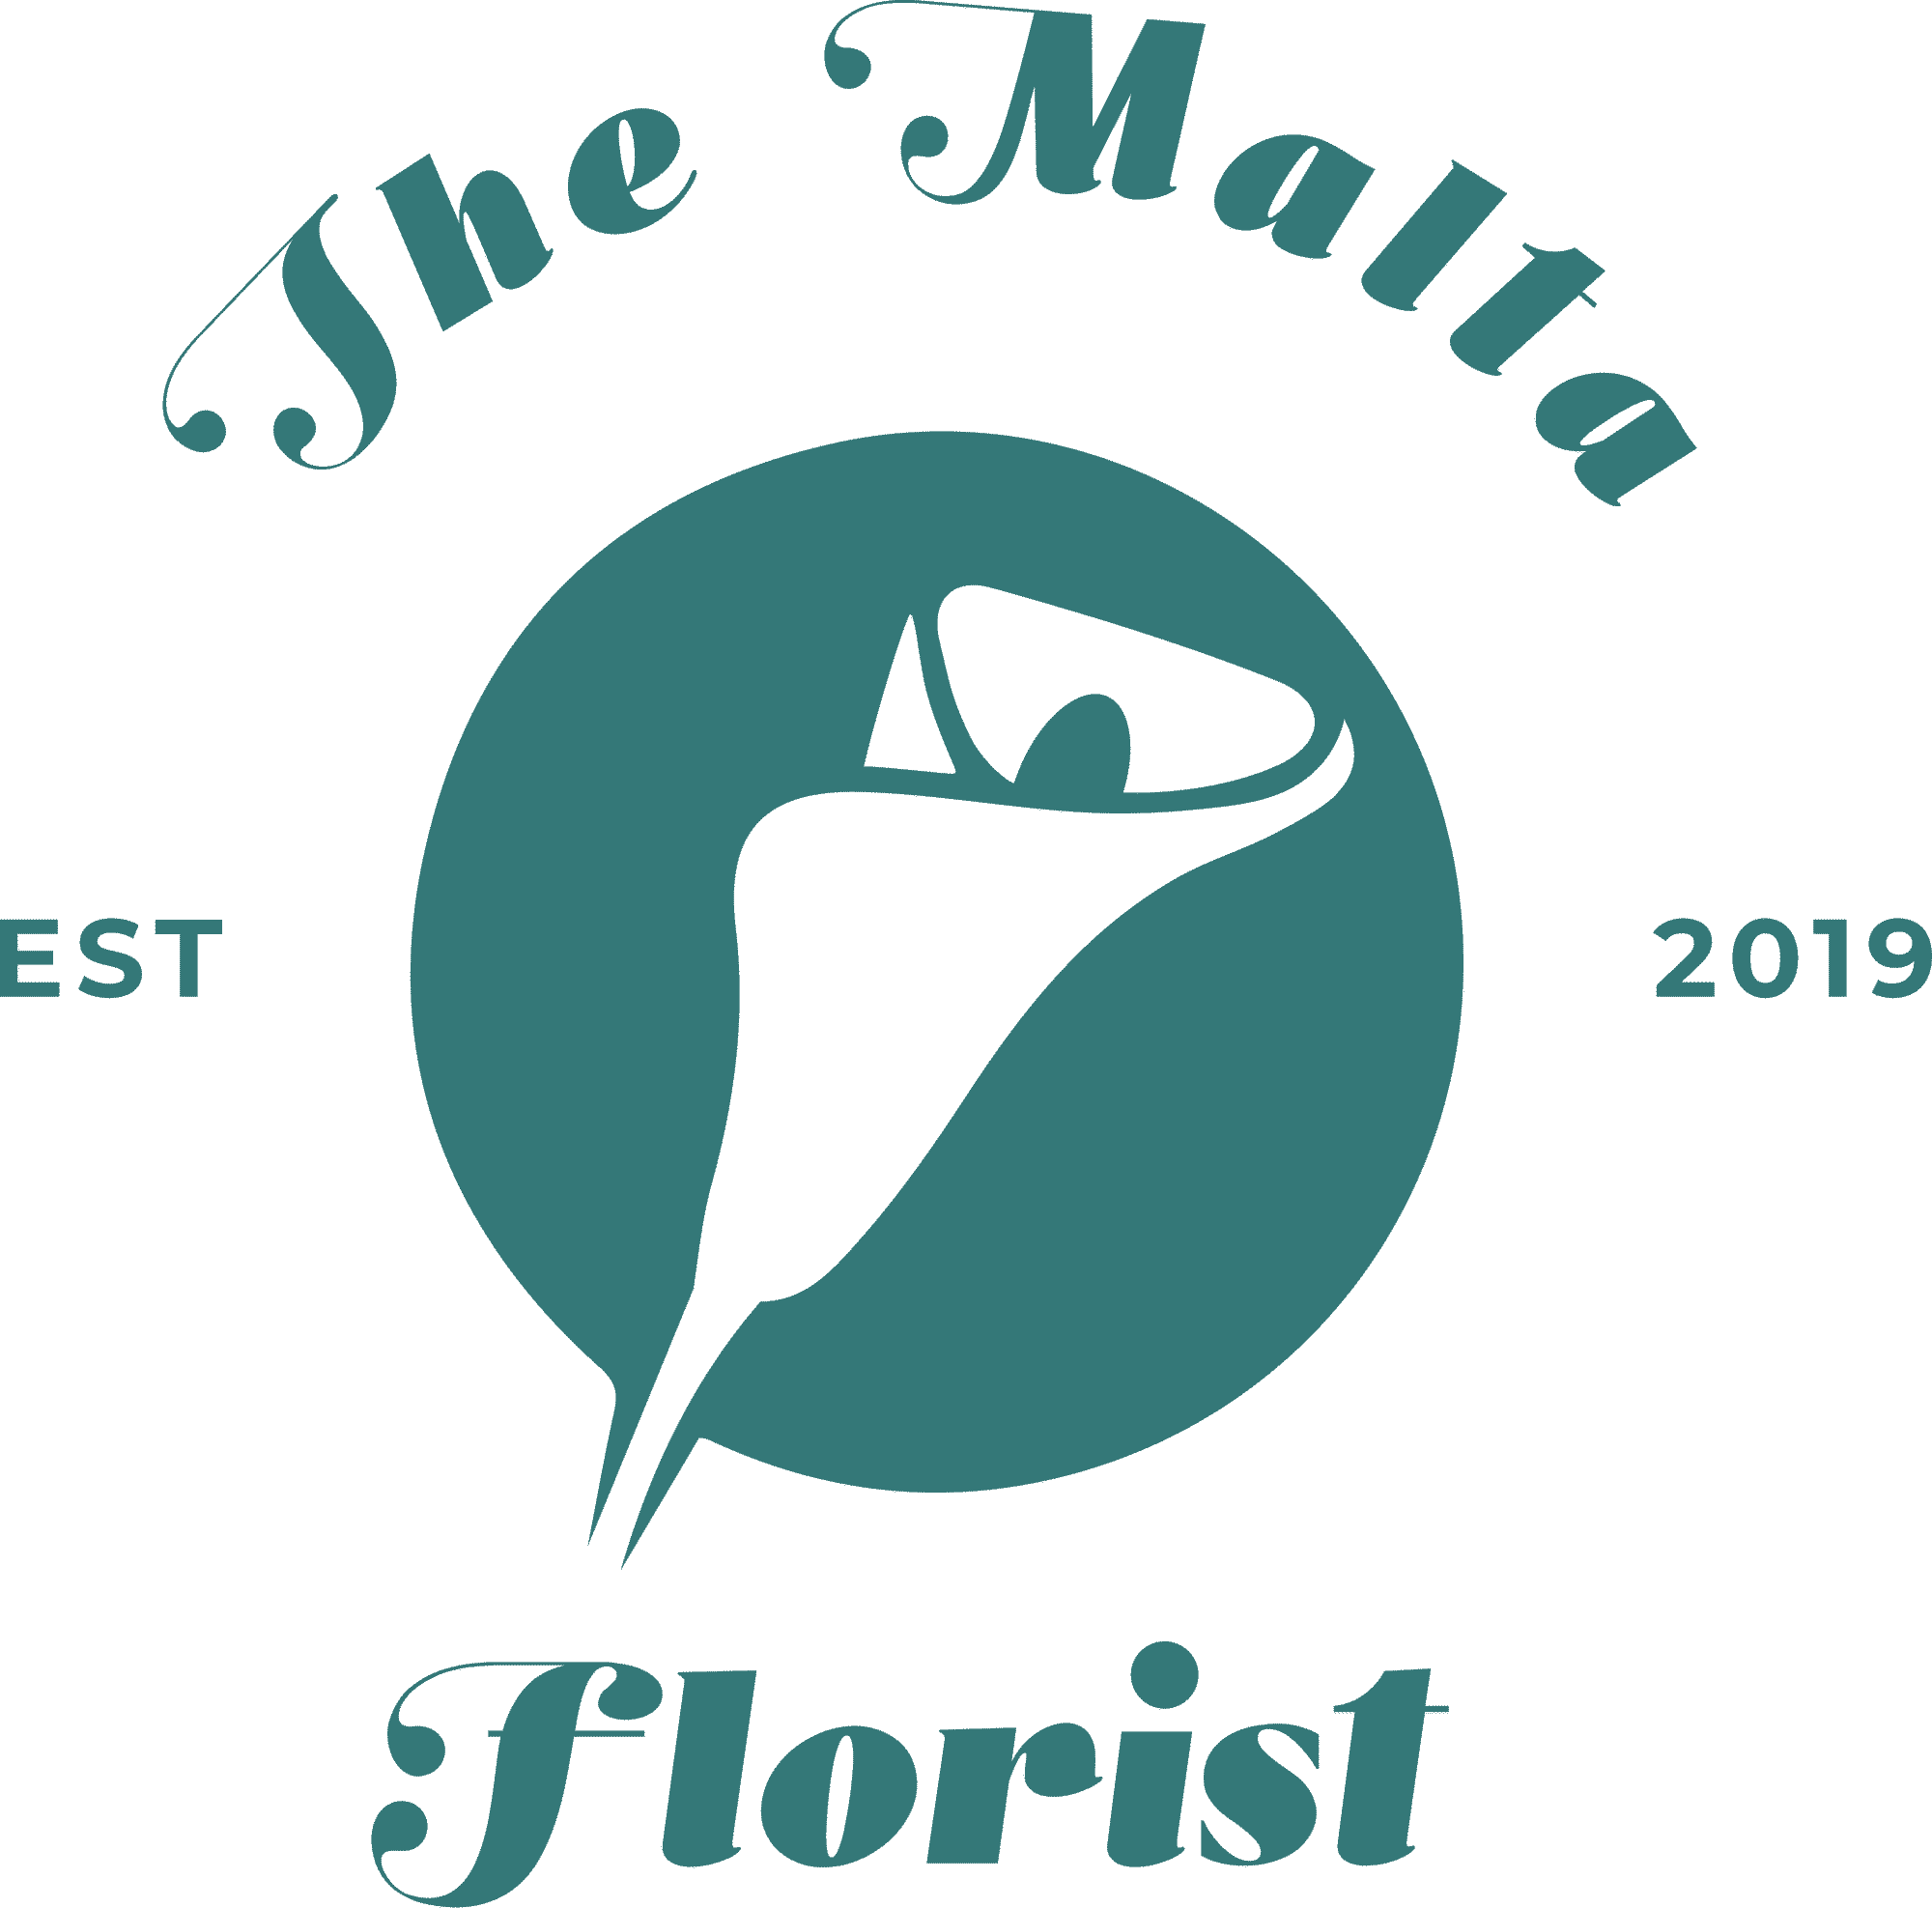 The Malta Florist